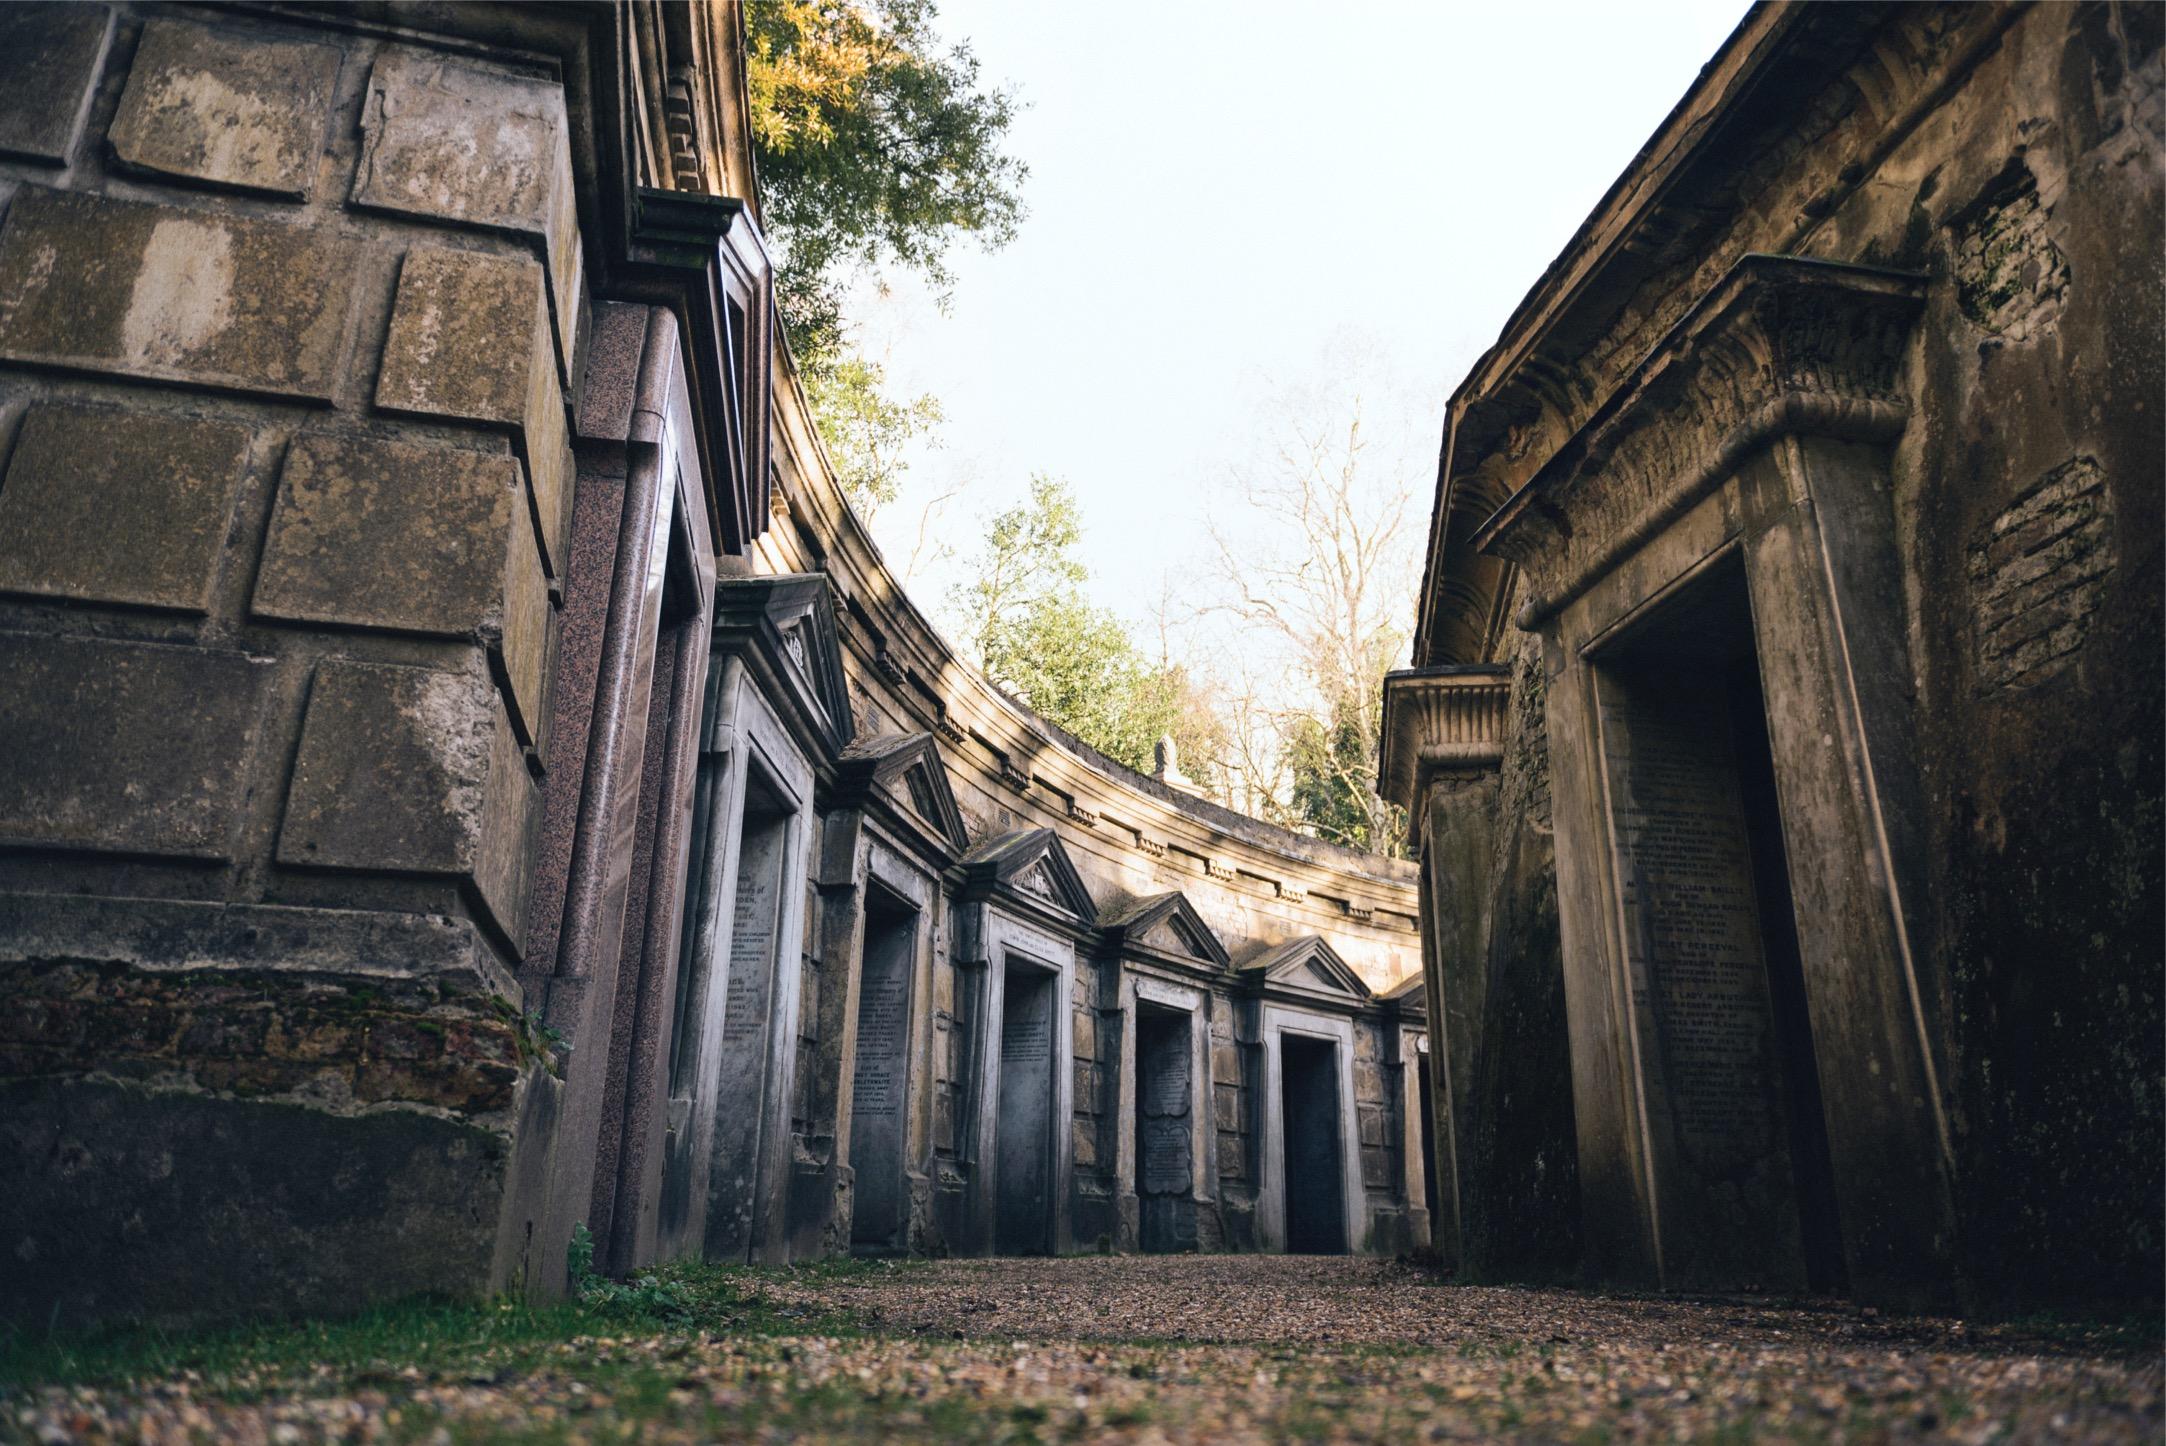 London Cementeries Halloween 2016 Highgate Cemetery - creative commons taken by Elizabeth Ellis